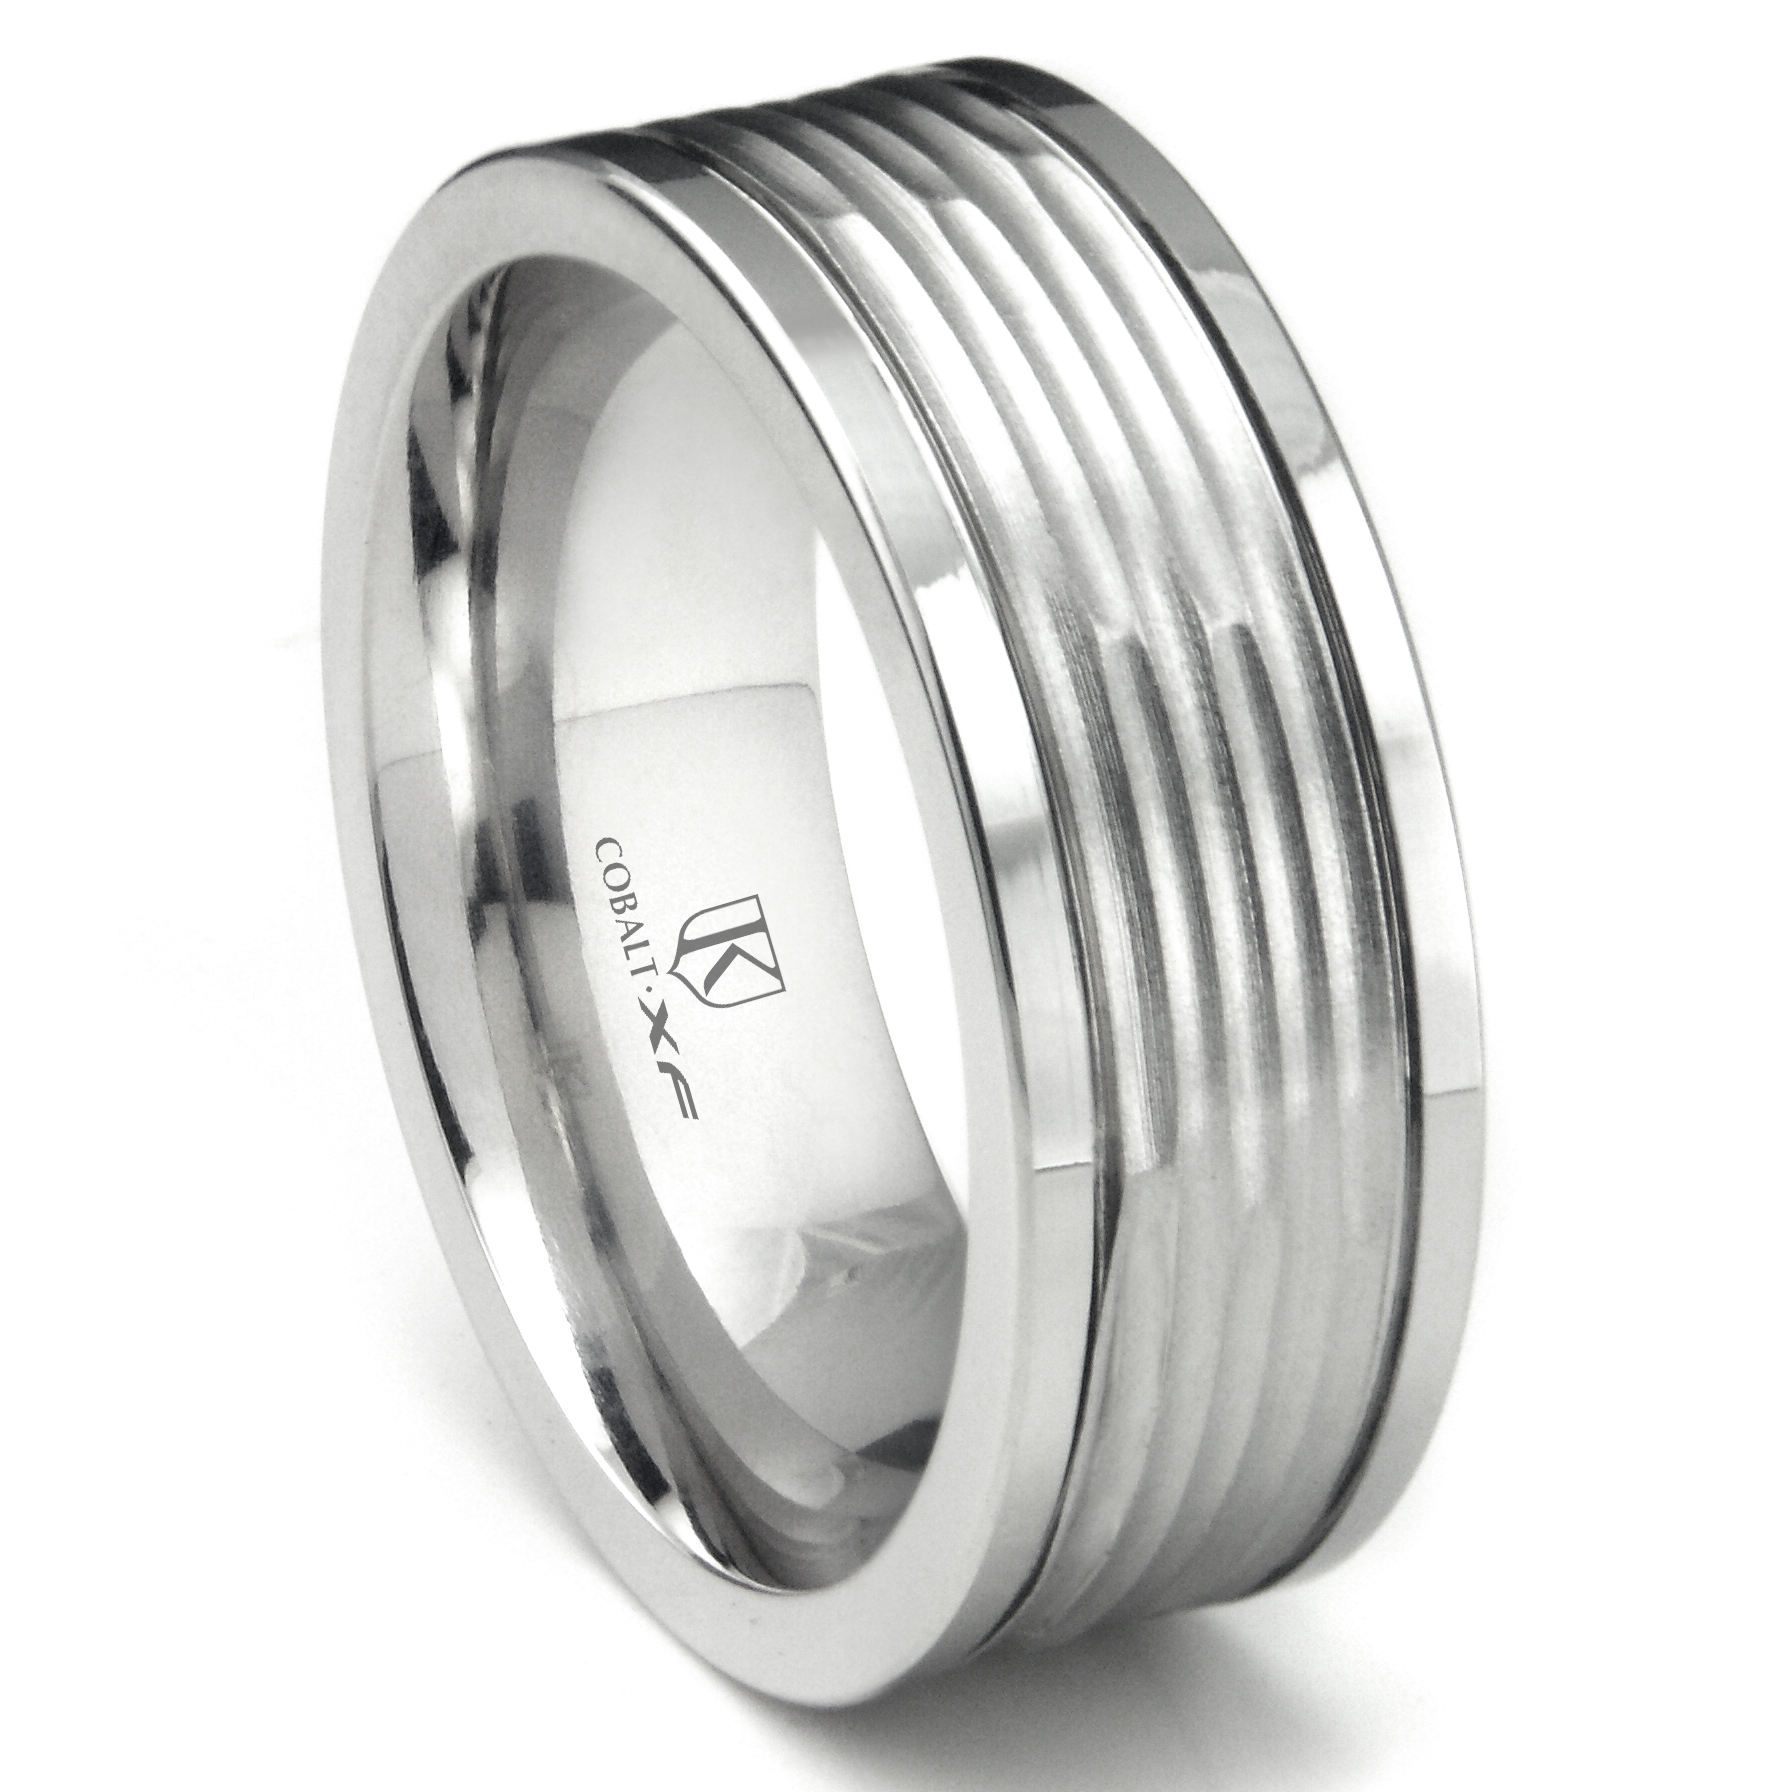 Cobalt XF Chrome 9MM Hammer Finish Wedding Band Ring